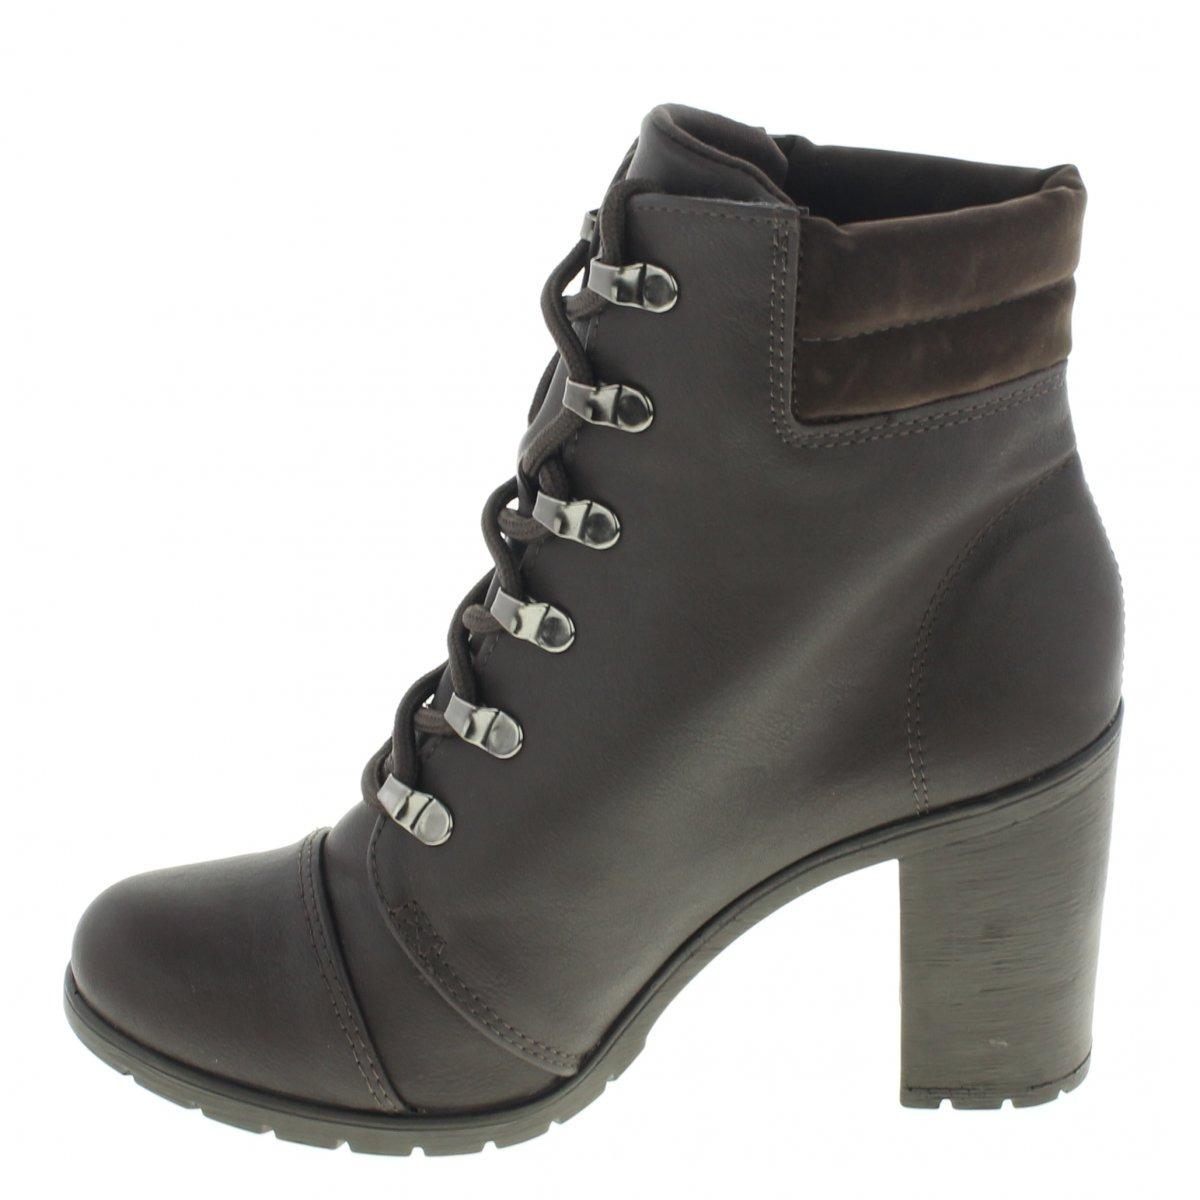 d83e419012 bota coturno dakota b9571 camurça salto feminino. Carregando zoom.